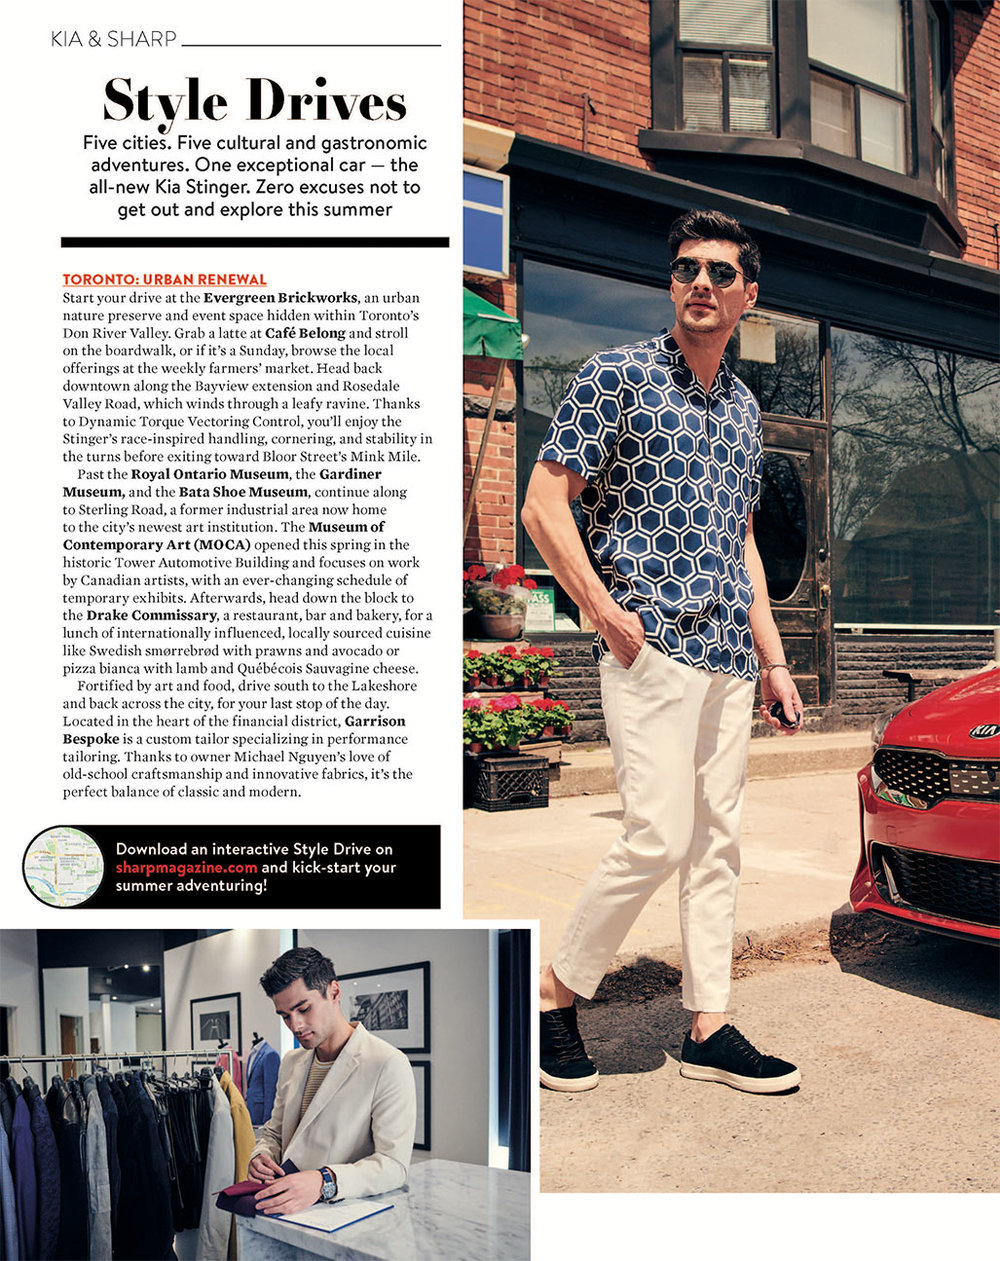 Kia: Style Drives